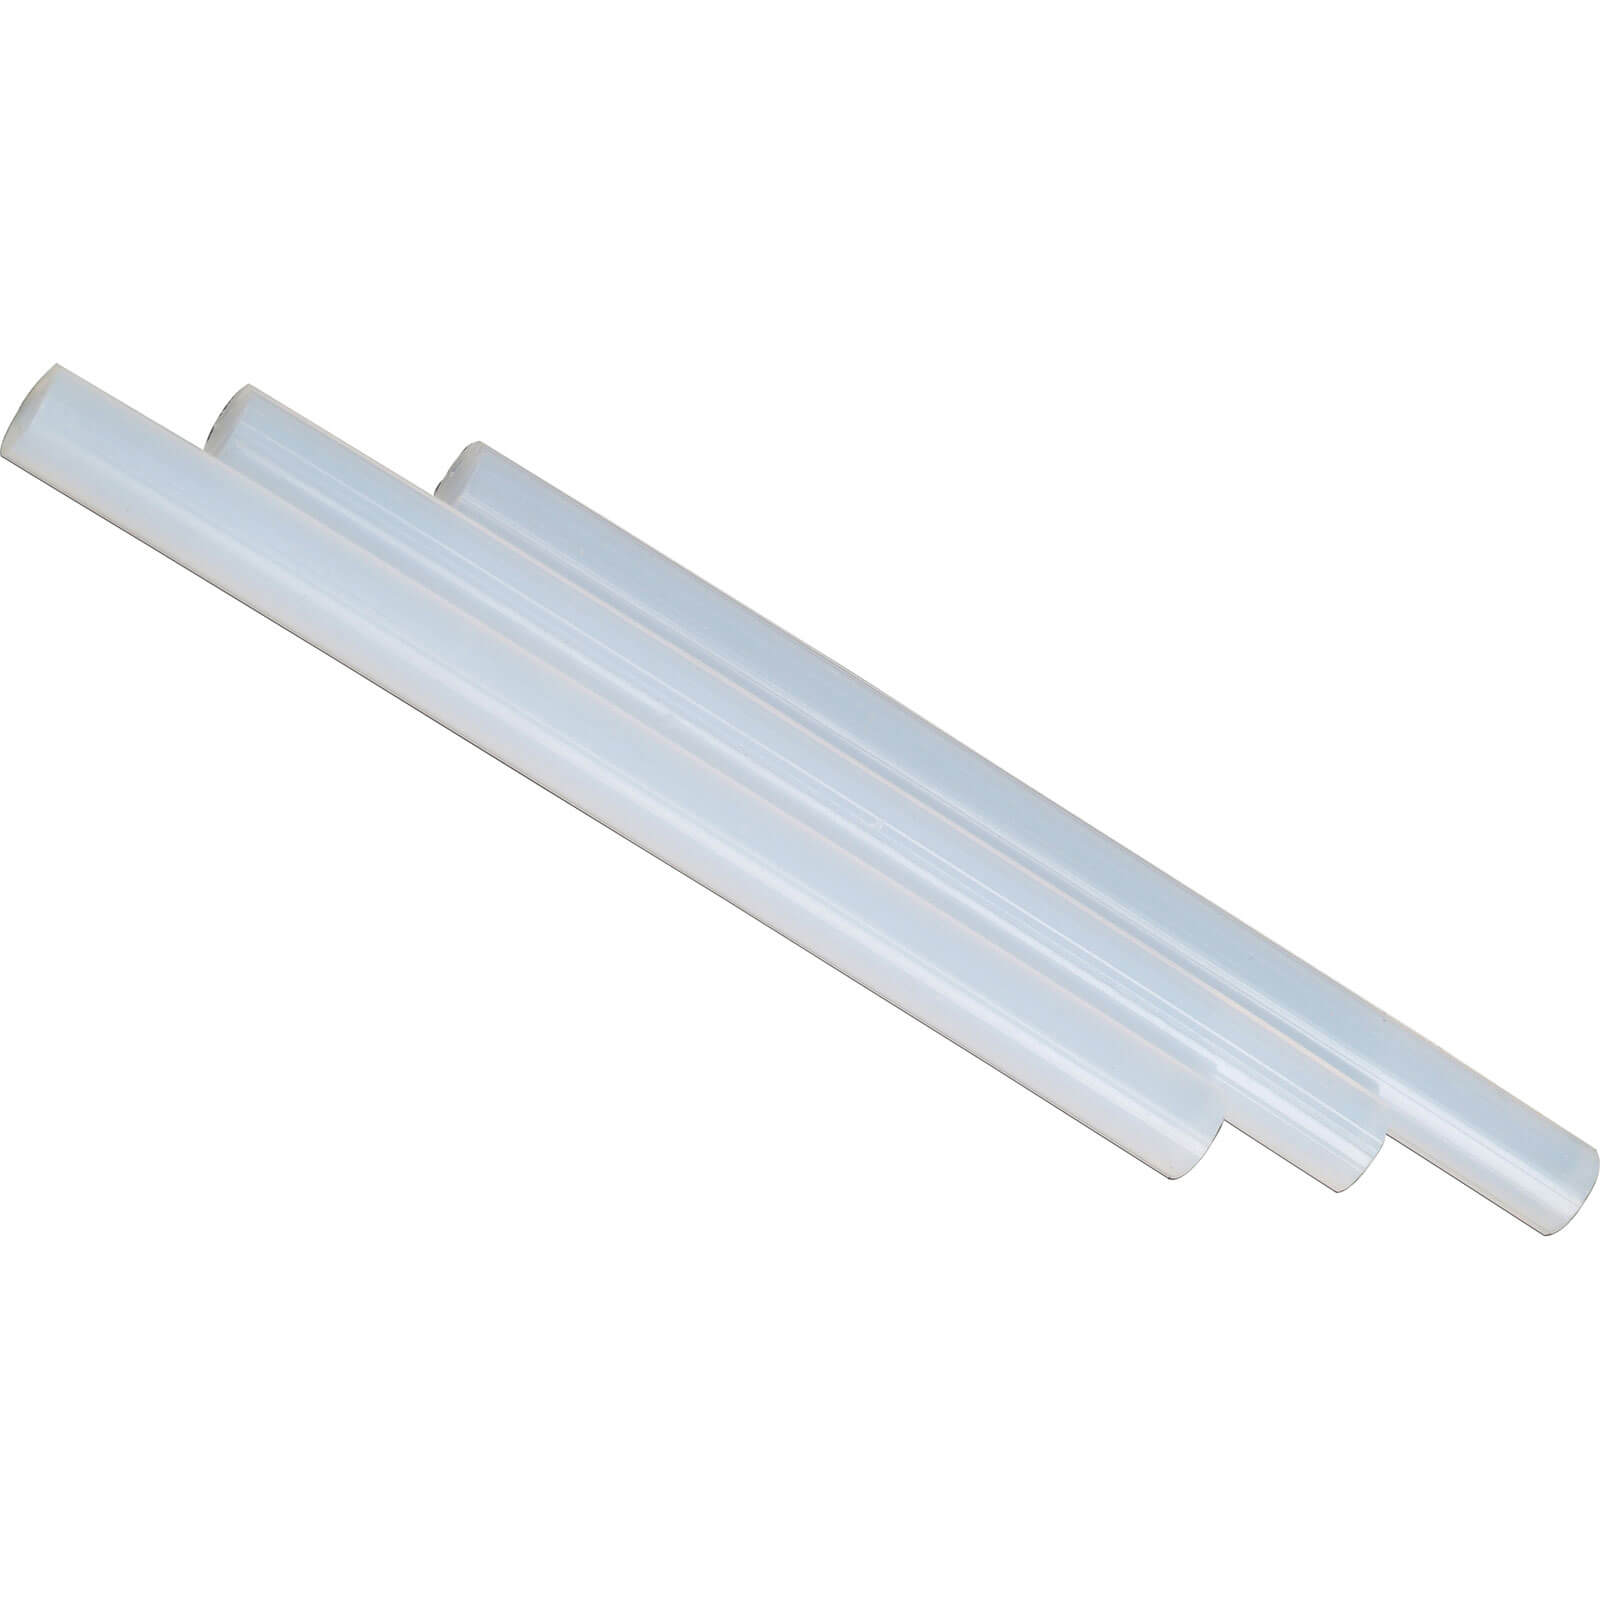 Image of Bostik 7mm Diameter Bulk Glue Sticks 7mm 100mm Pack of 240